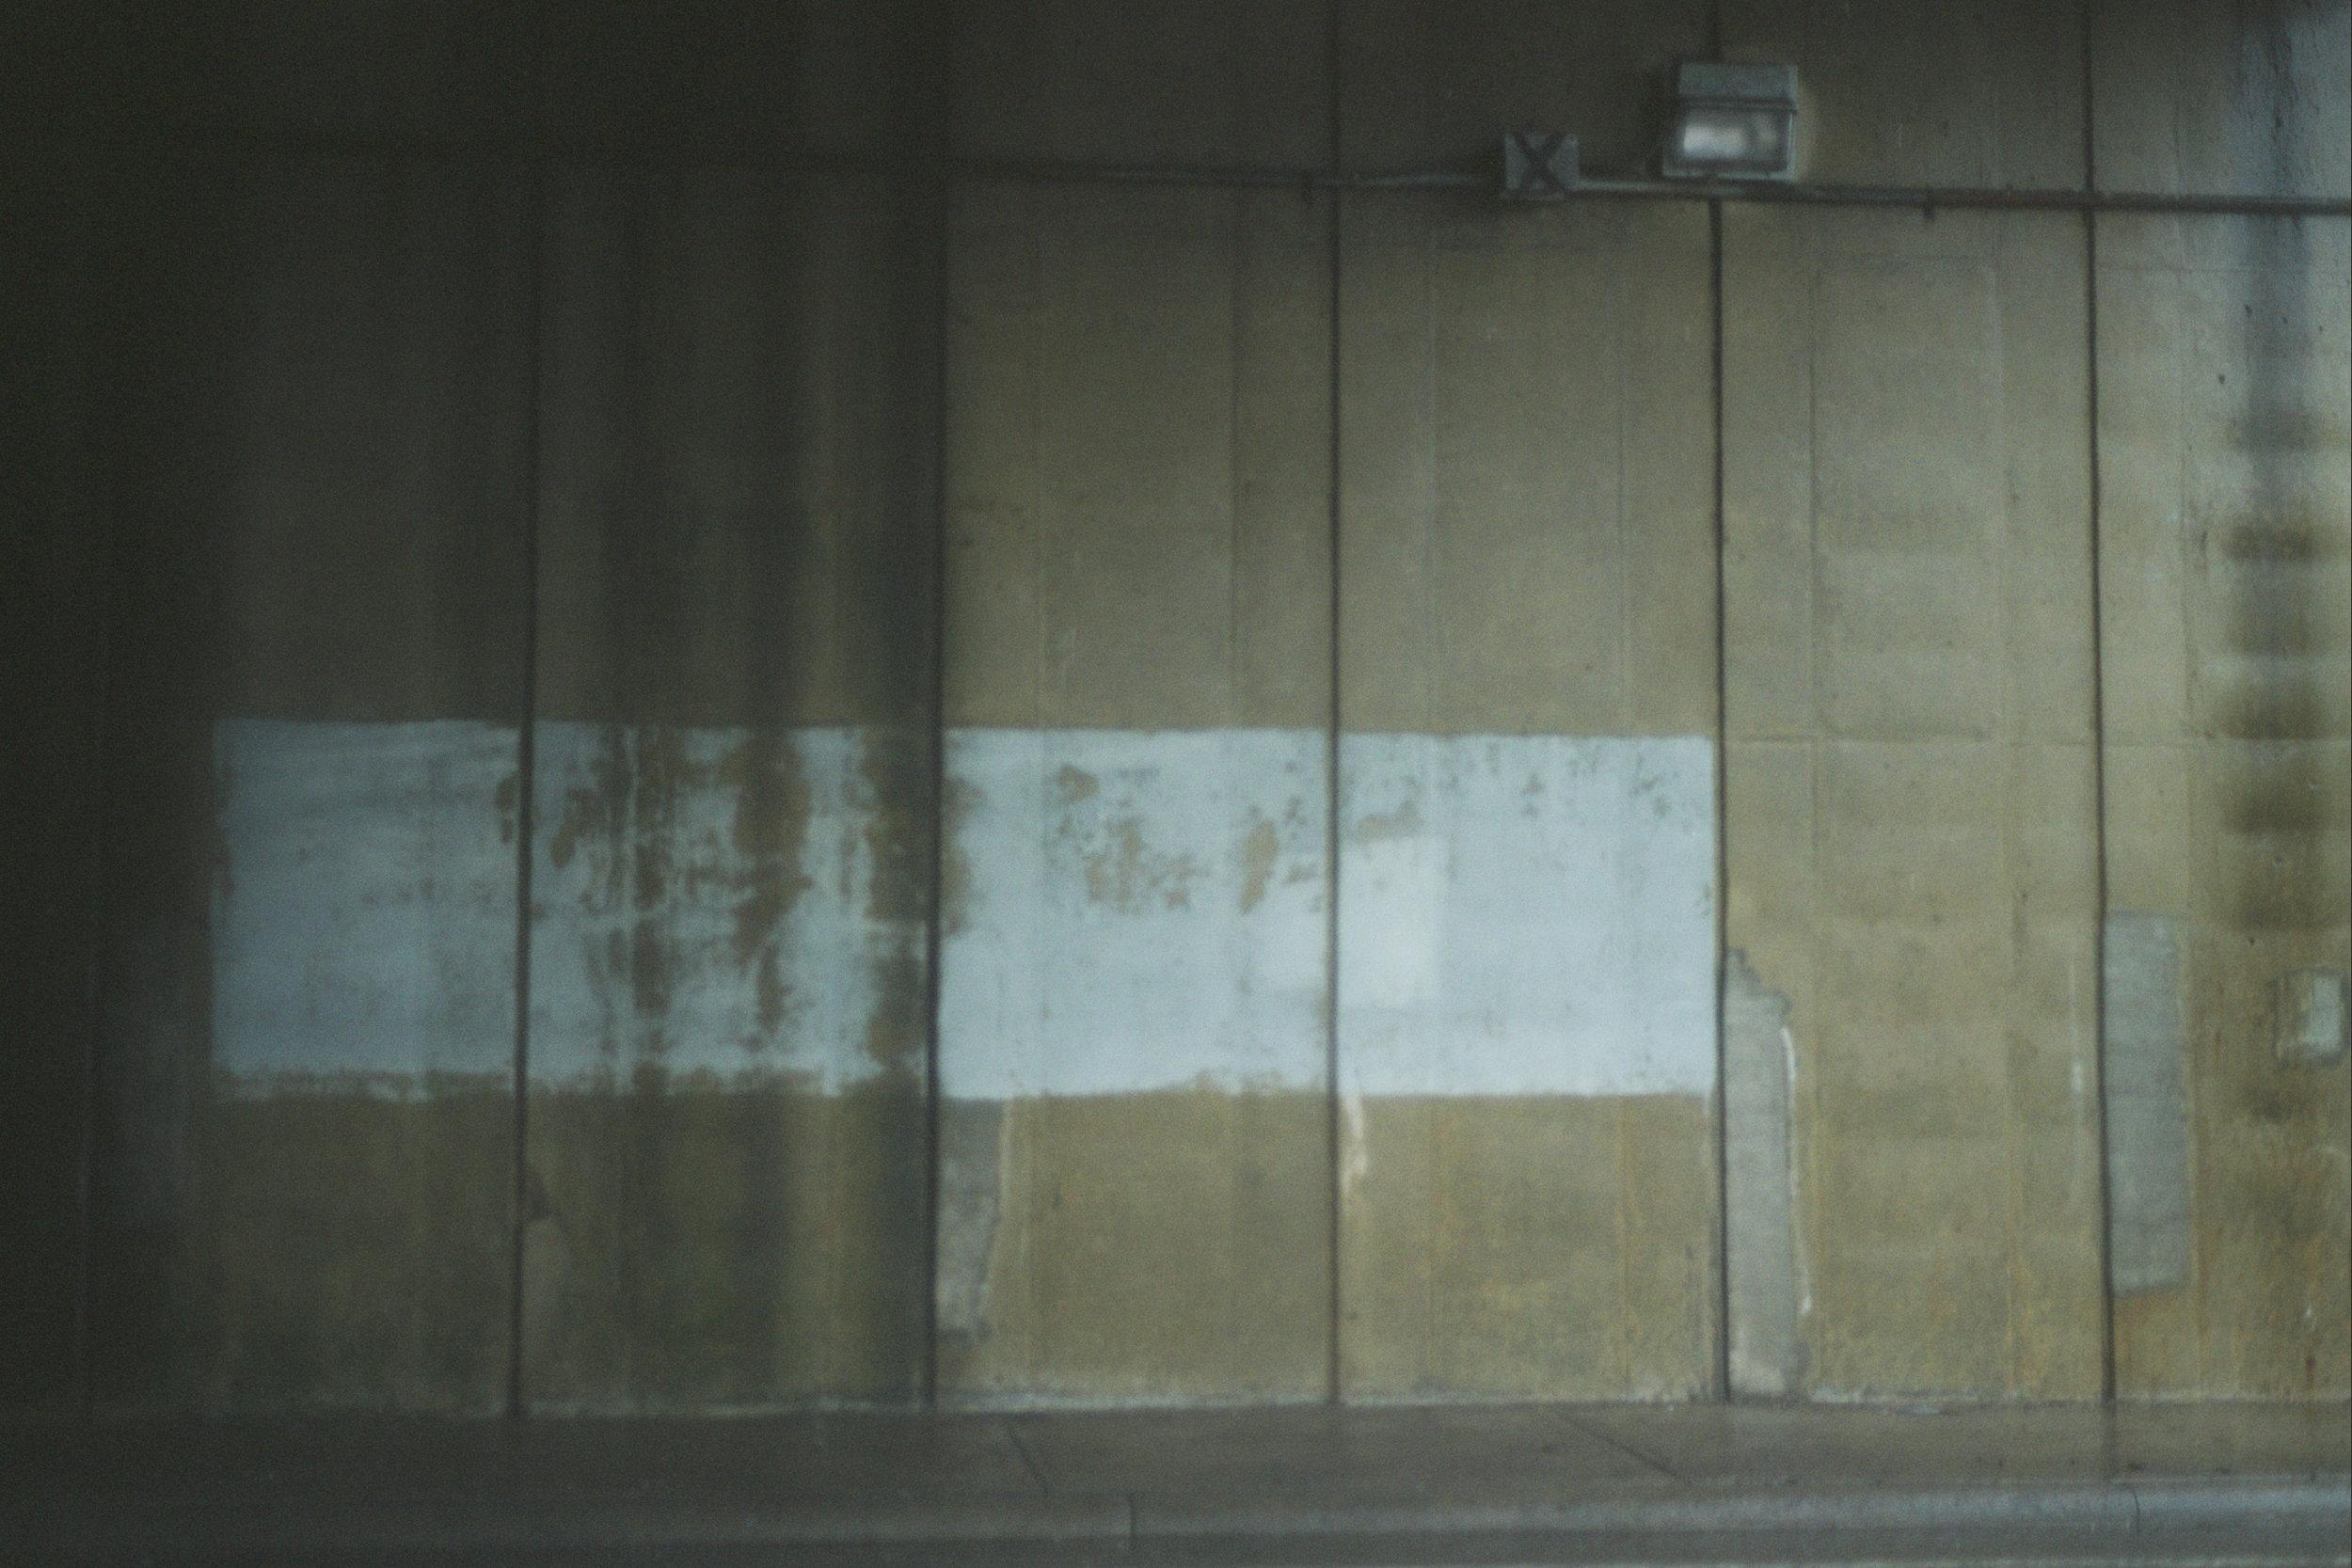 Look at that good wall texture.